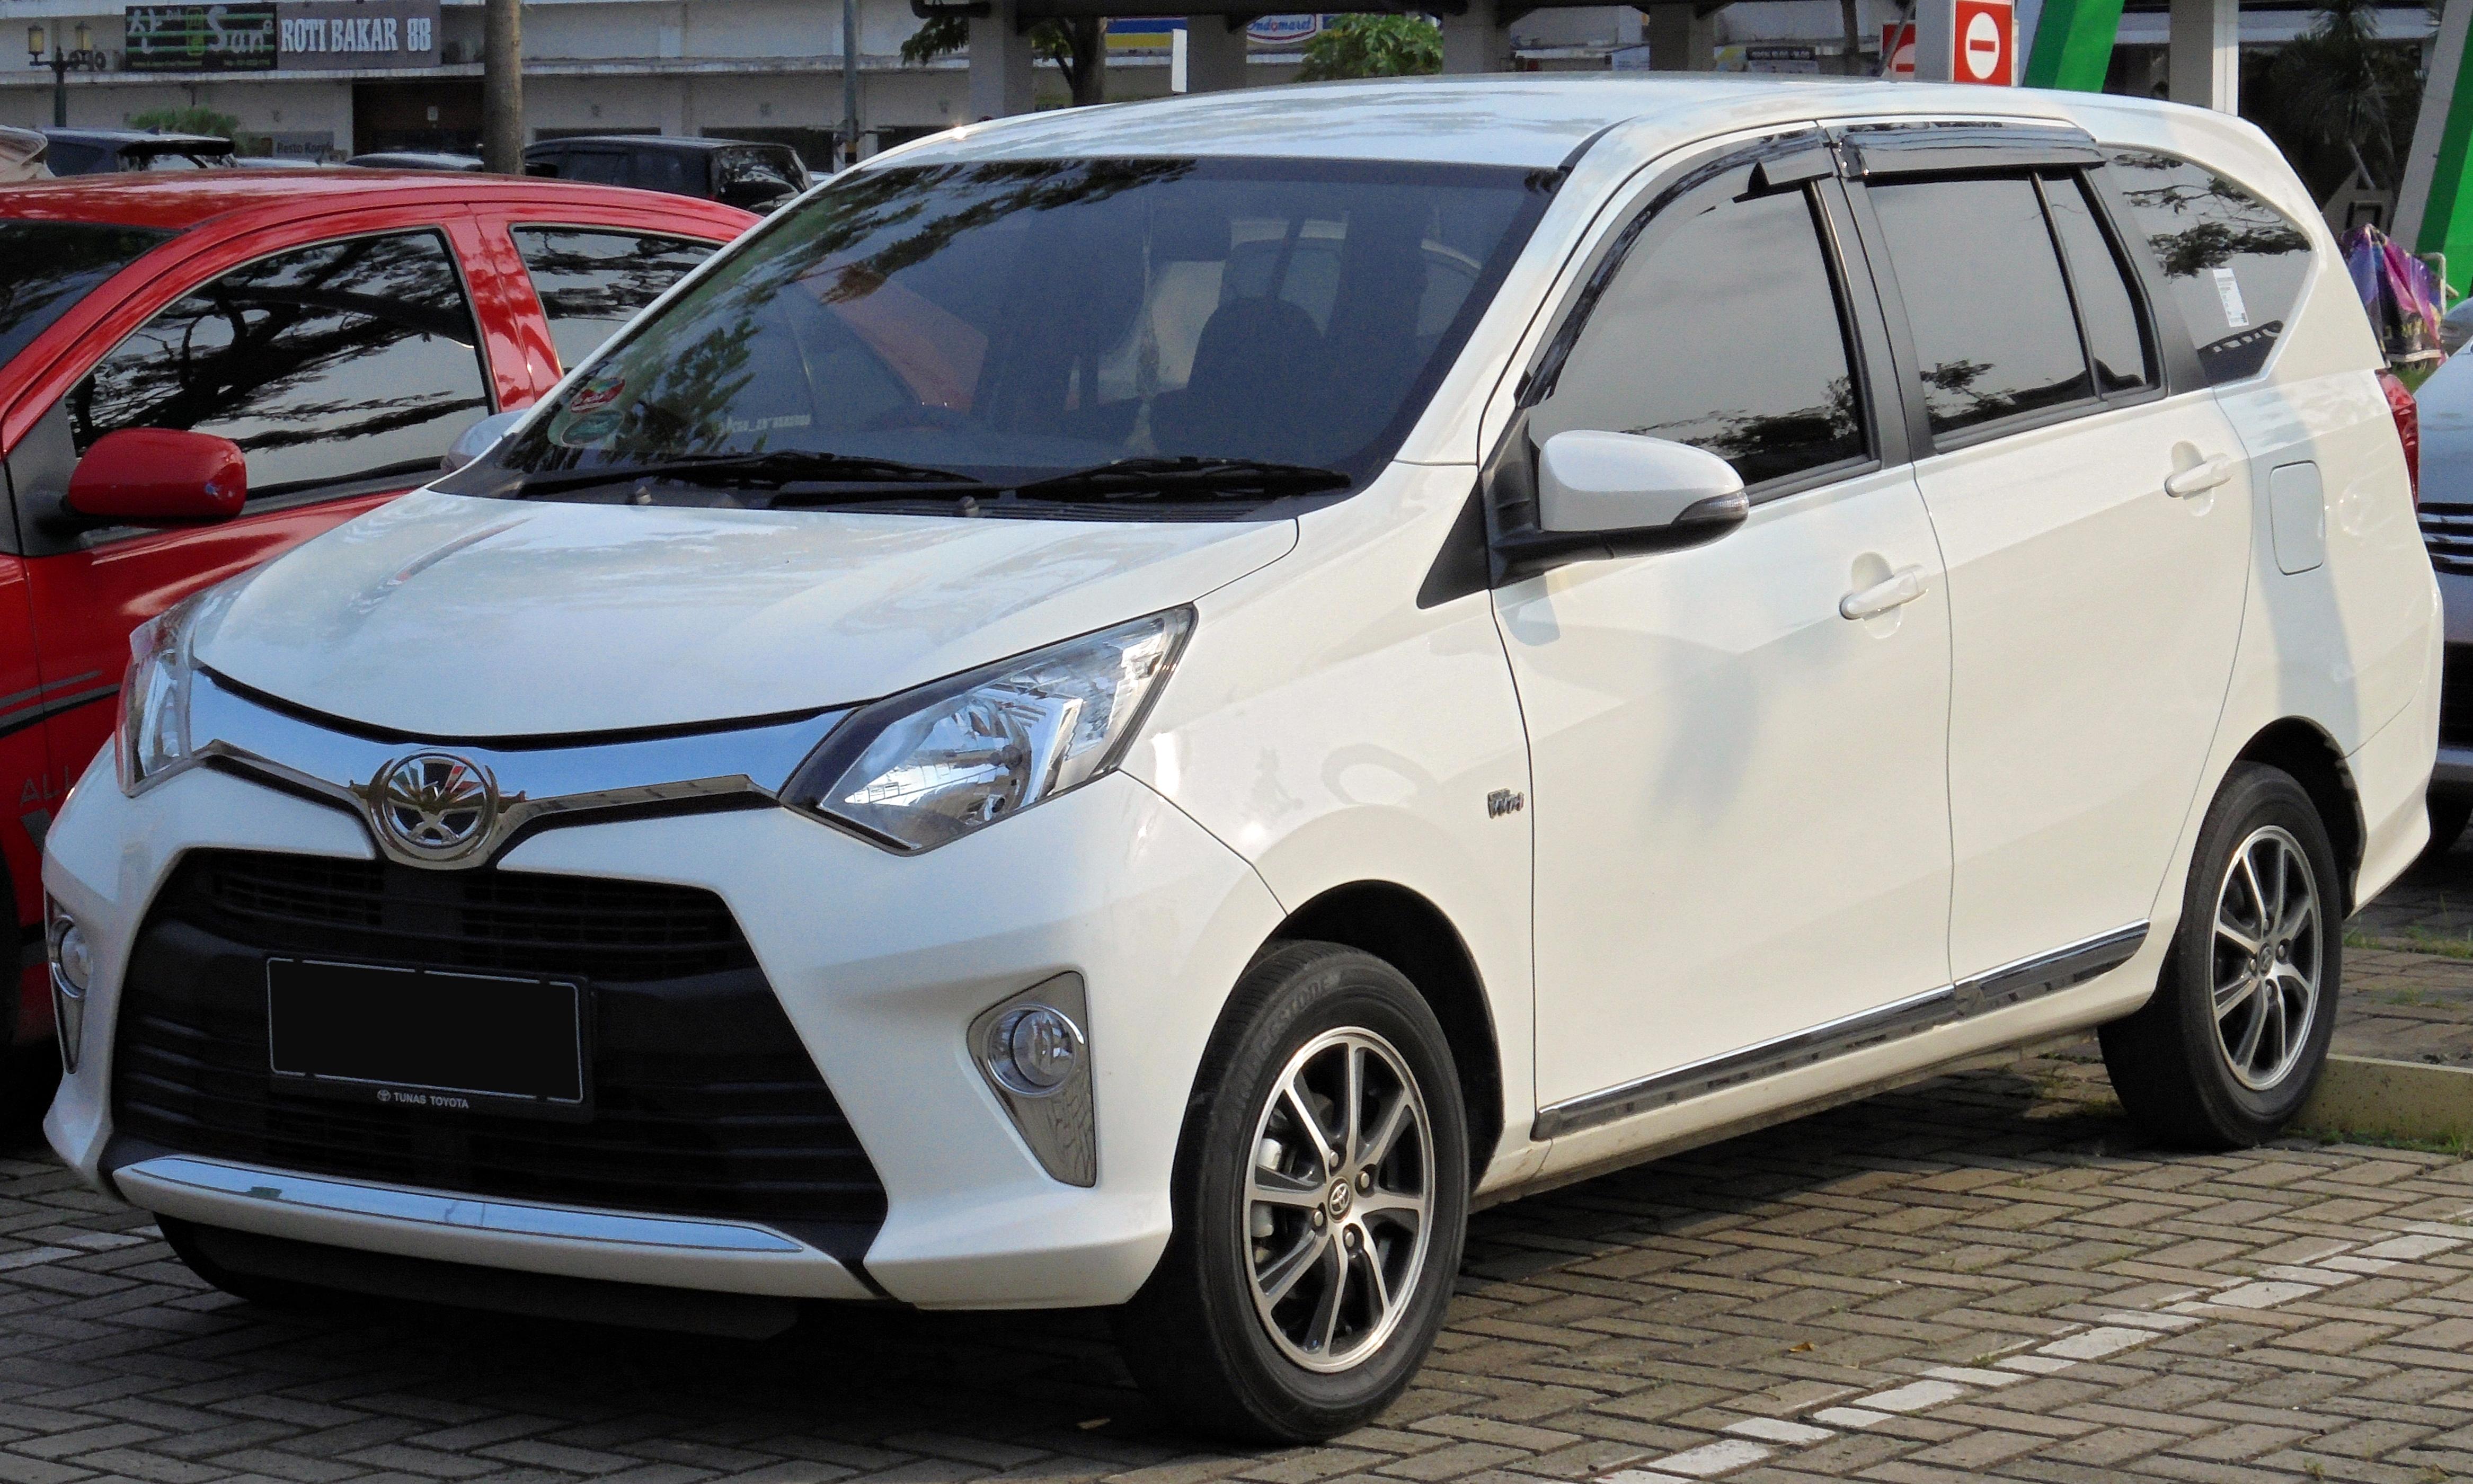 File:2017 Toyota Calya 1.2 G Wagon (B401RA; 01-12-2019